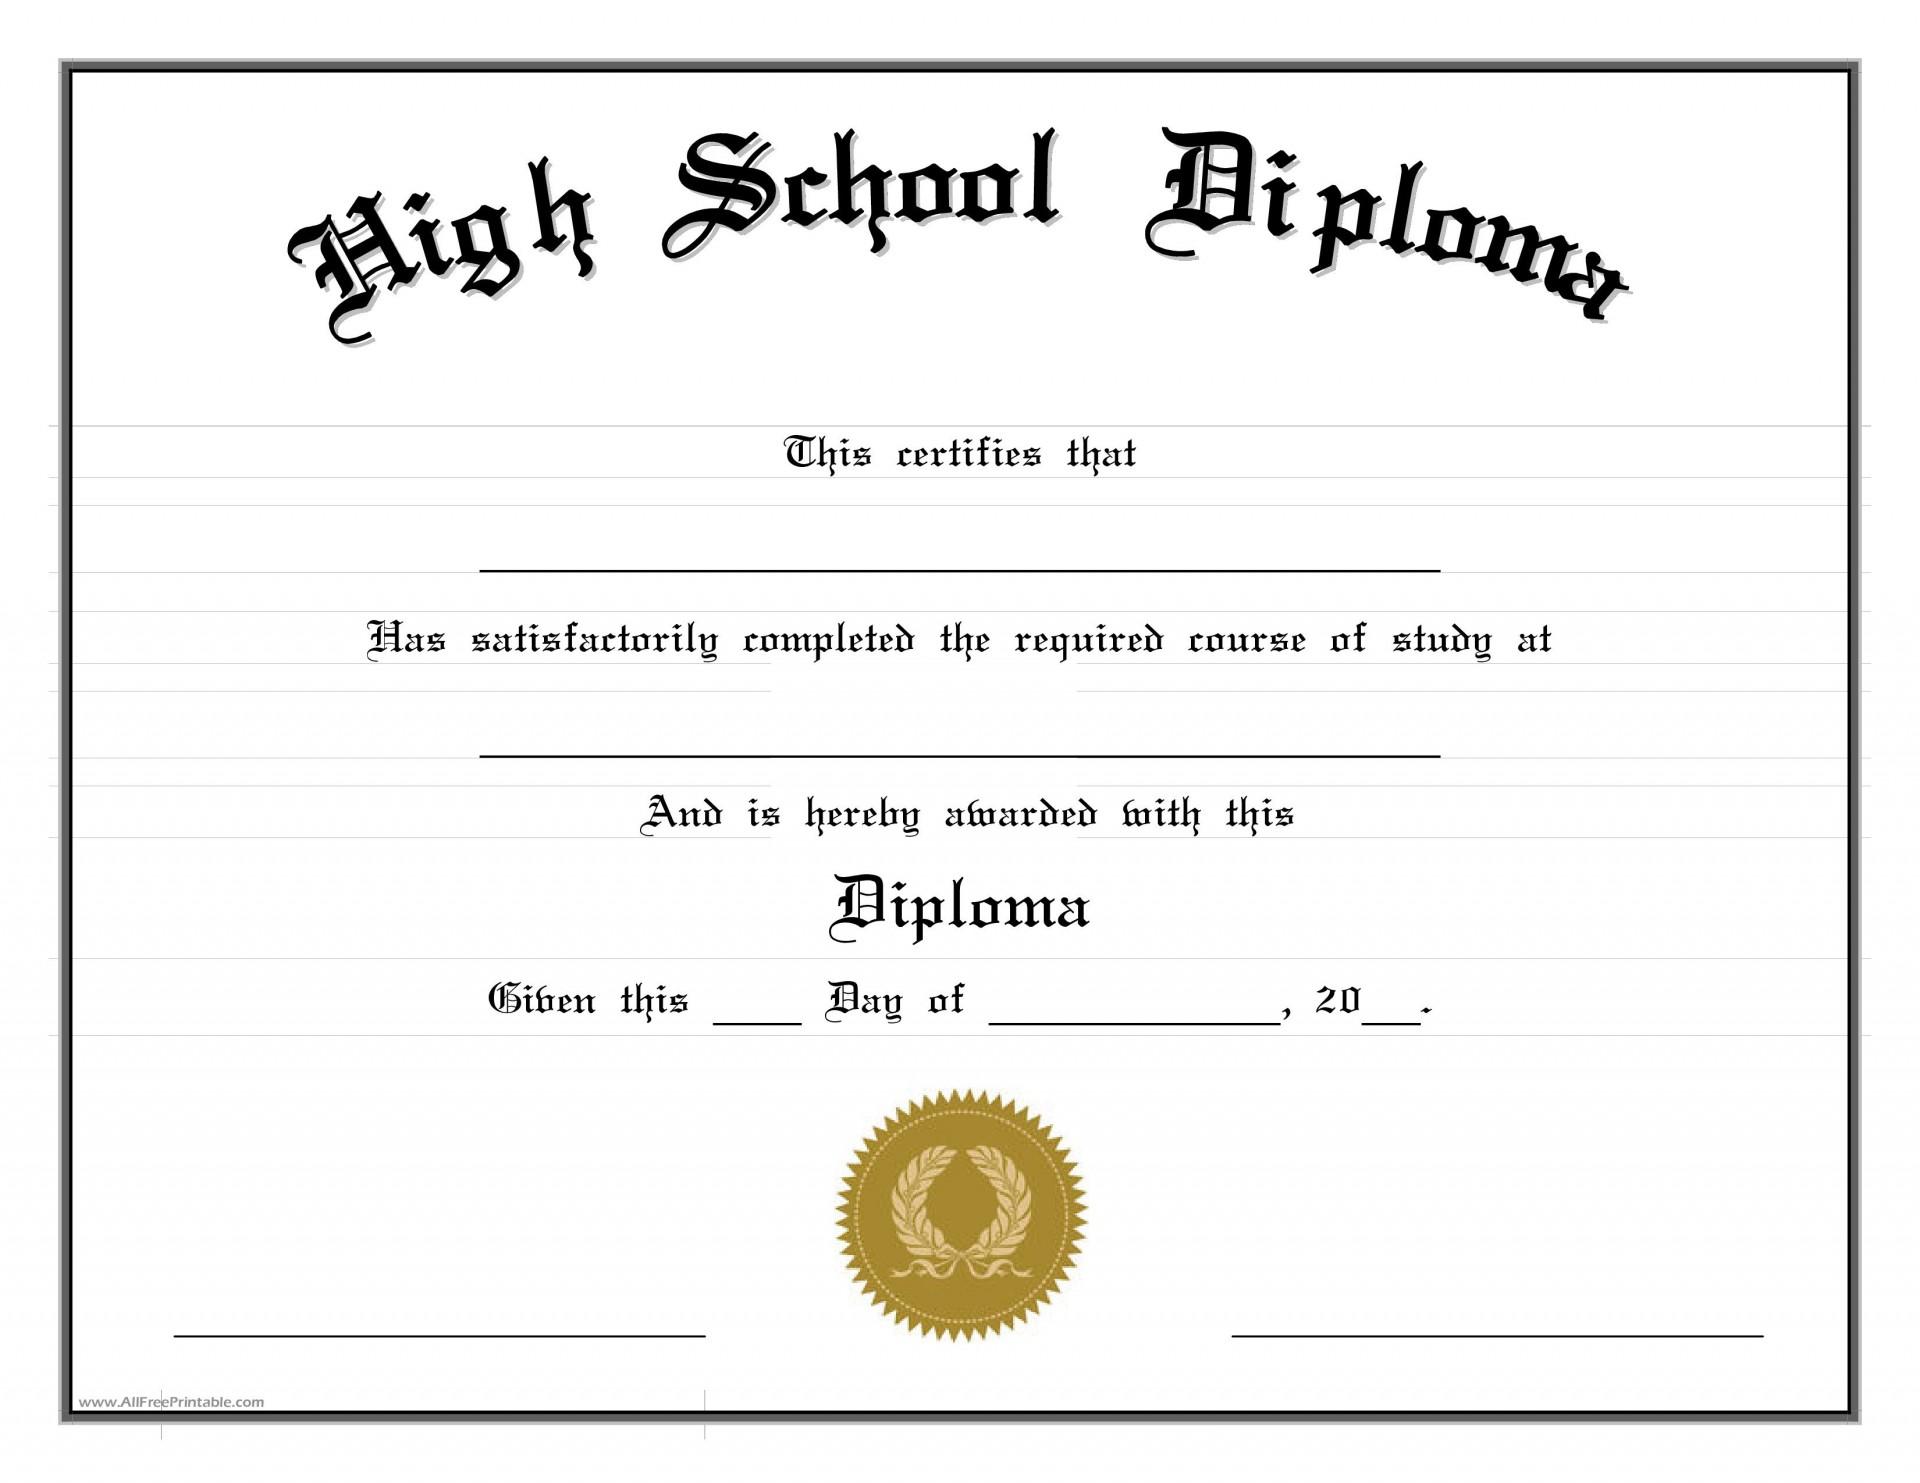 000 Stupendou Free High School Diploma Template Example  Templates Print Out Editable Printable1920